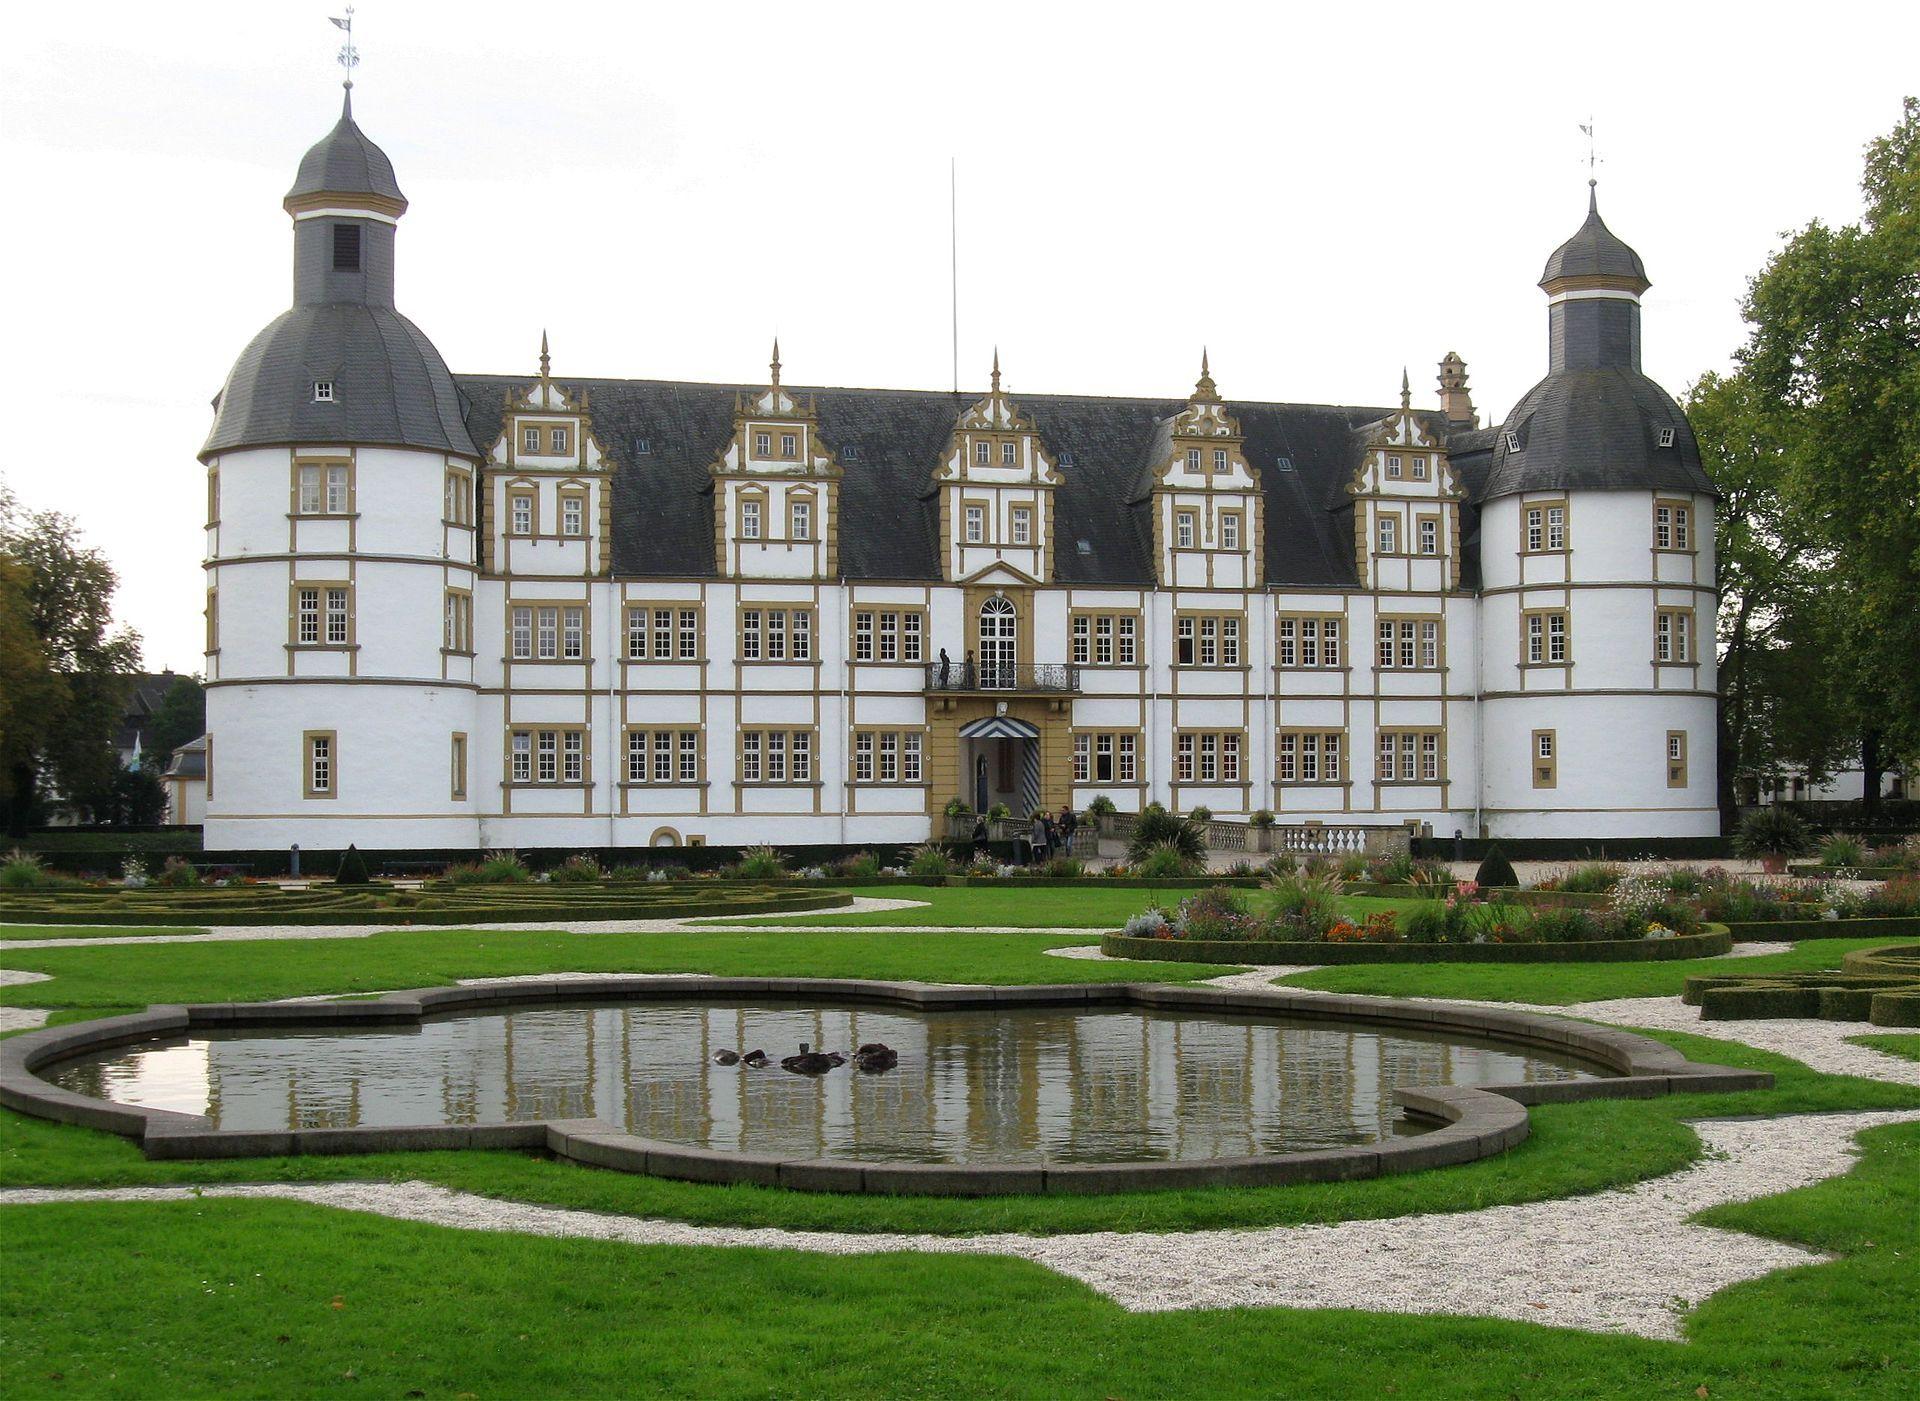 Schloss Neuhaus Gartenseite Paderborn 3 Schloss Neuhaus Paderborn Wikipedia House Styles Mansions Castle